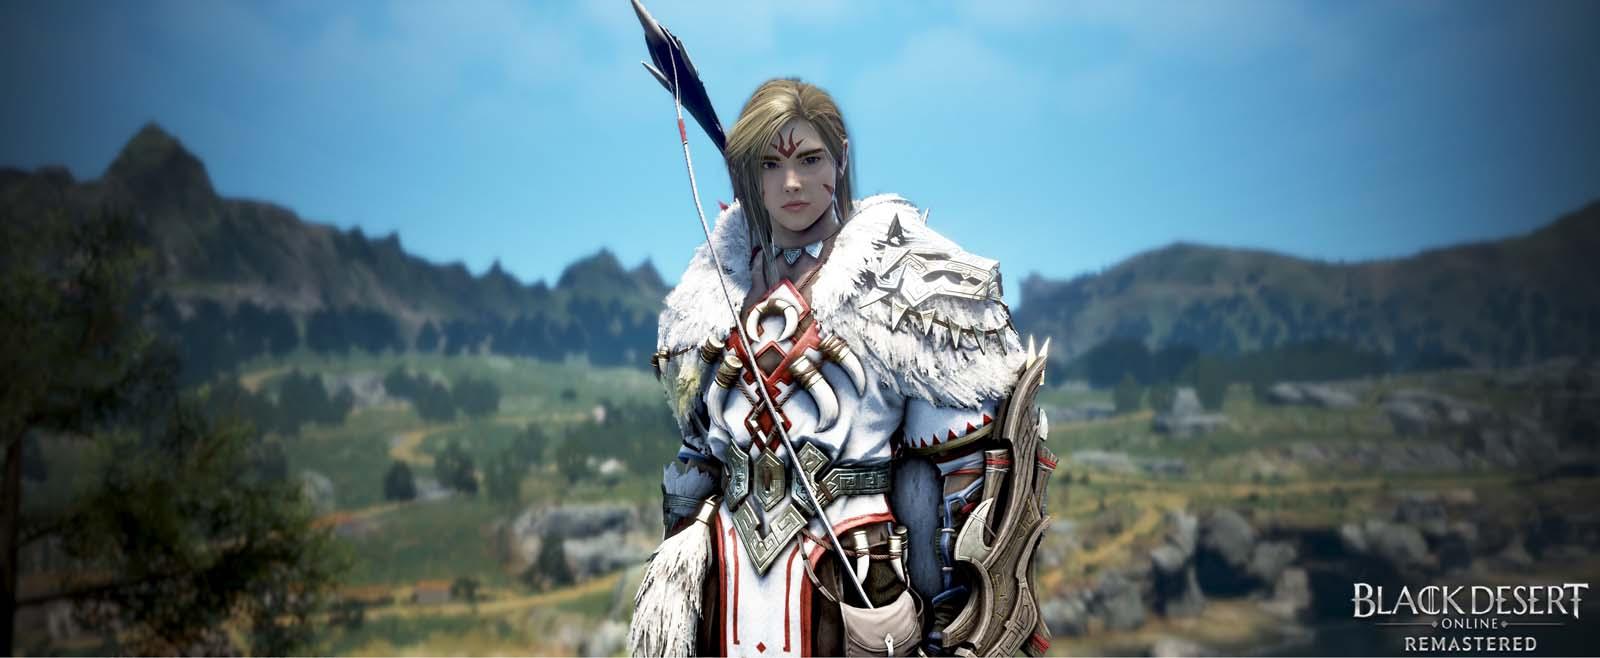 Black Desert Online Review (PlayStation 4)